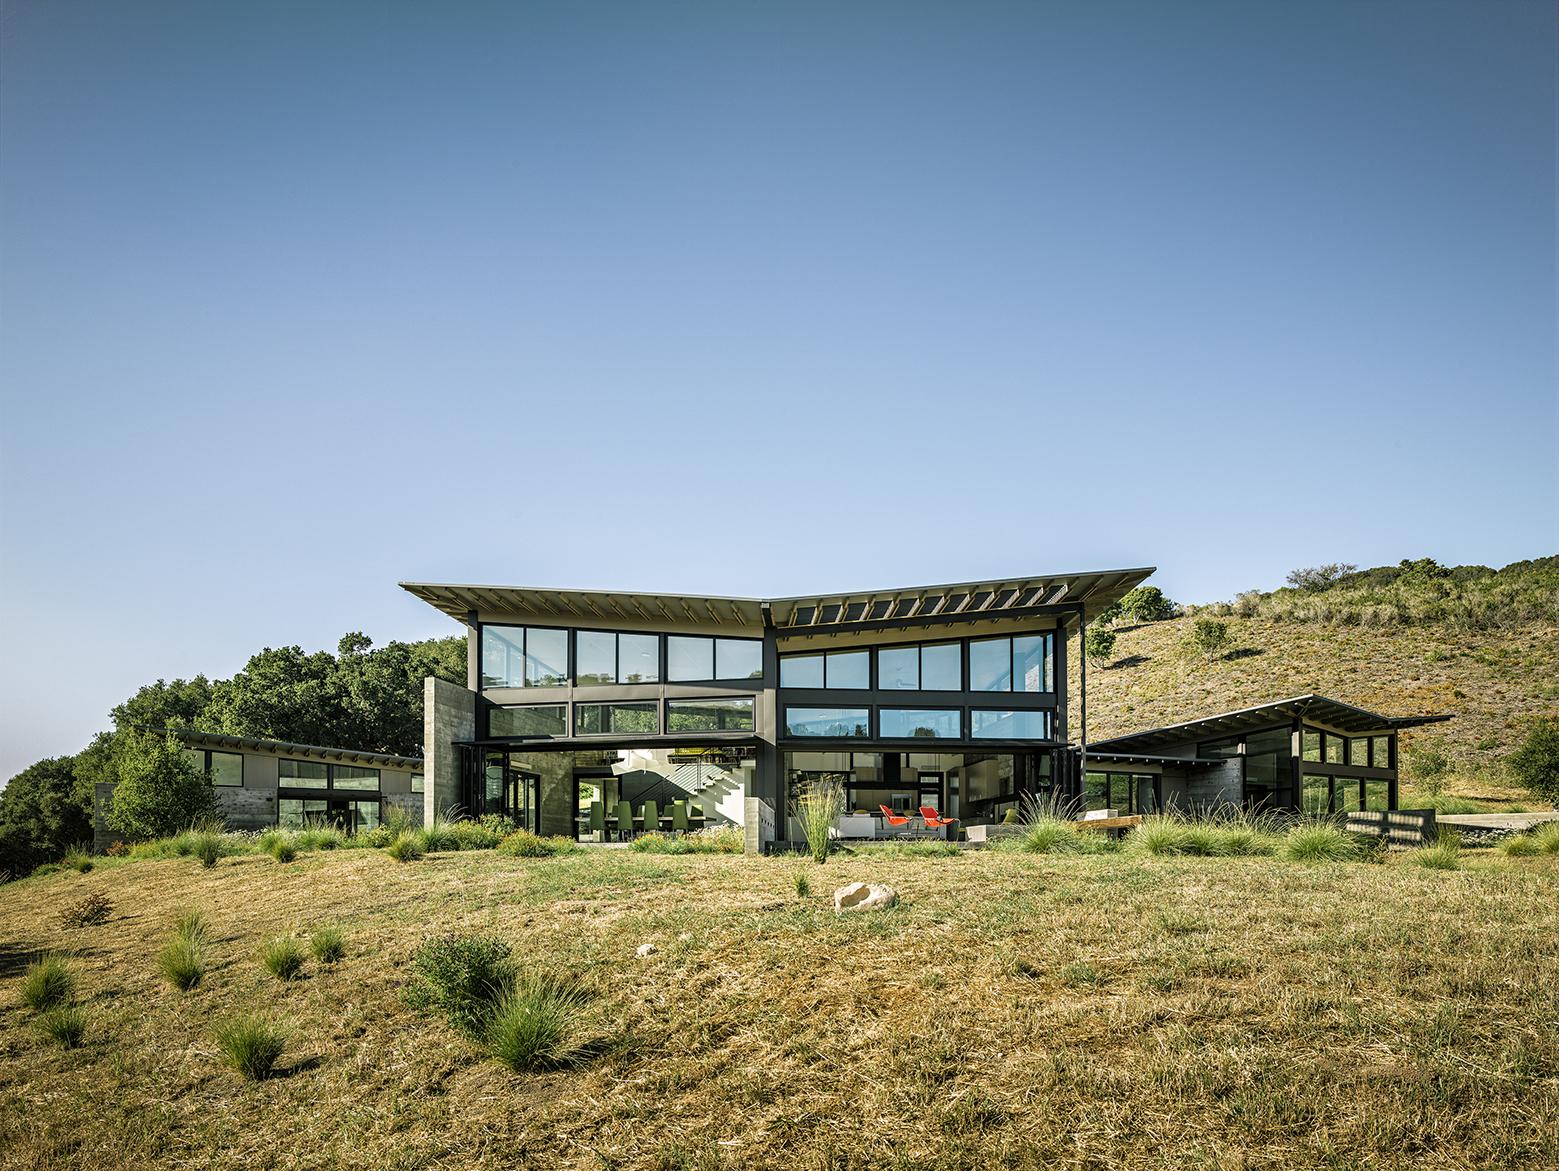 53bbac99c07a8005ce000353_butterfly-house-feldman-architecture_00portada